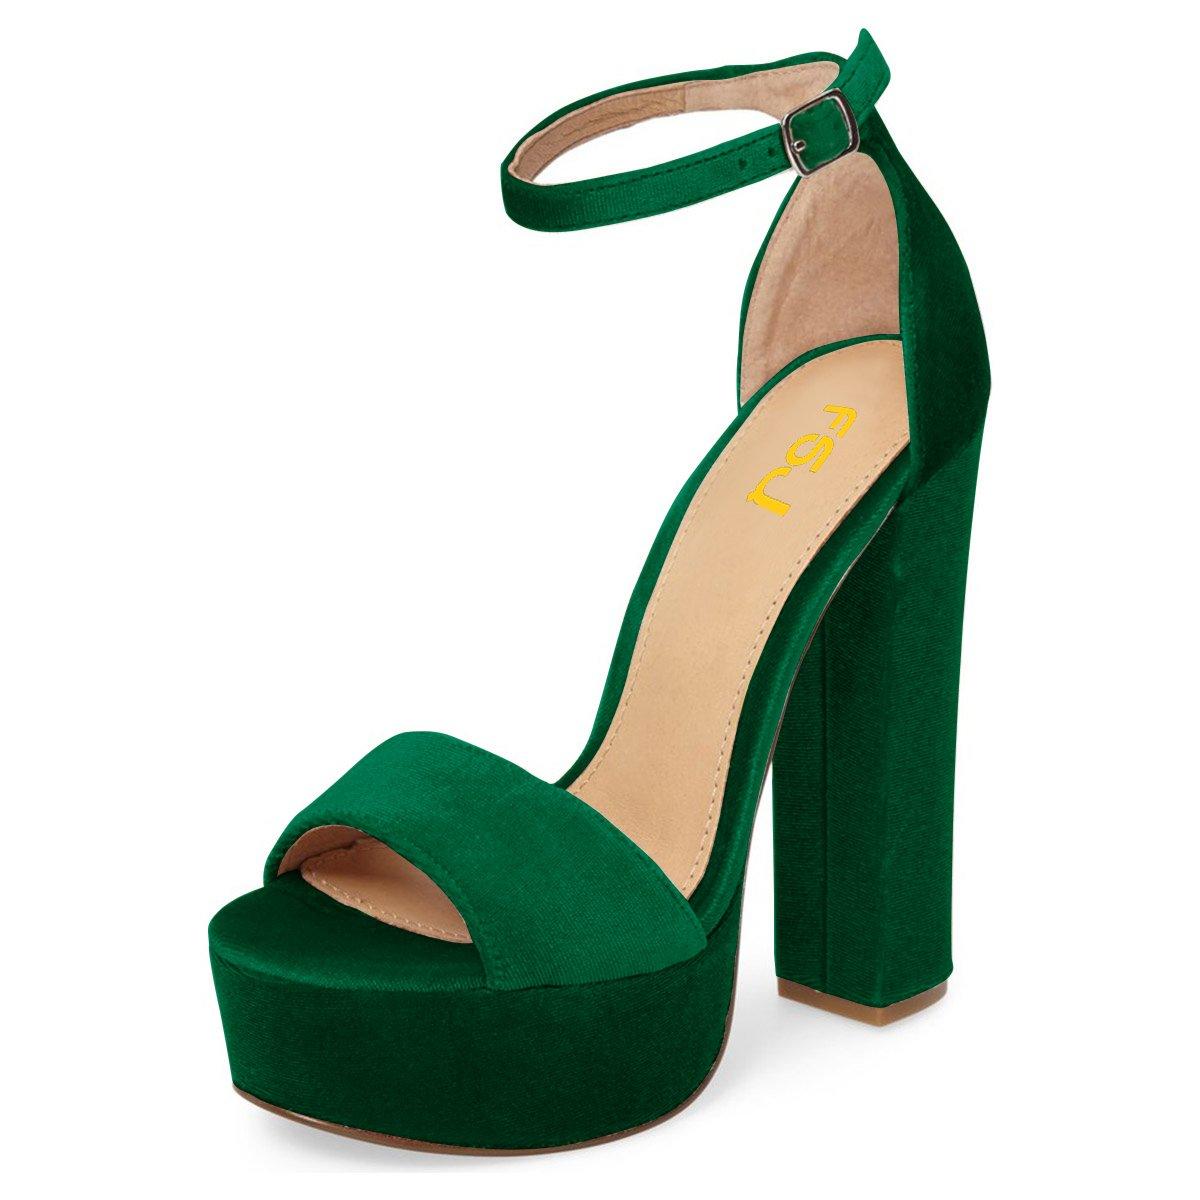 FSJ Women Sexy Ankle Strap Platform Sandals Chunky High Heel Open Toe Velvet Shoes Size 4-15 US B0796LSJ1Y 15 B(M) US Green